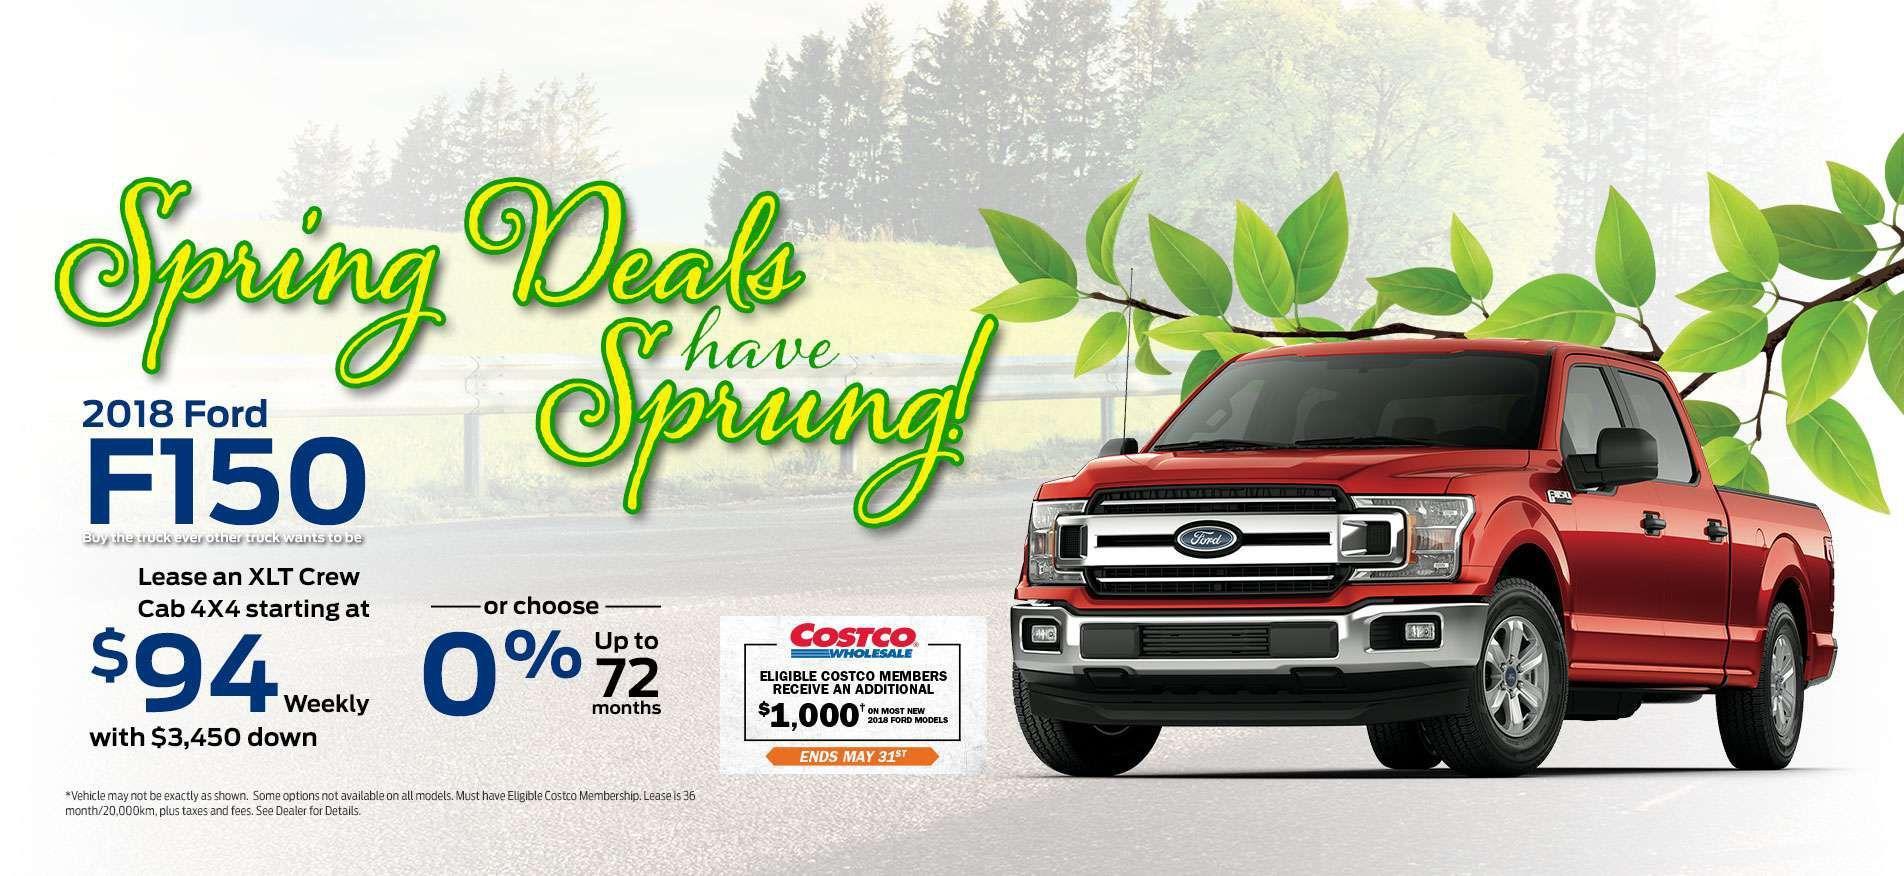 2018 Spring offer